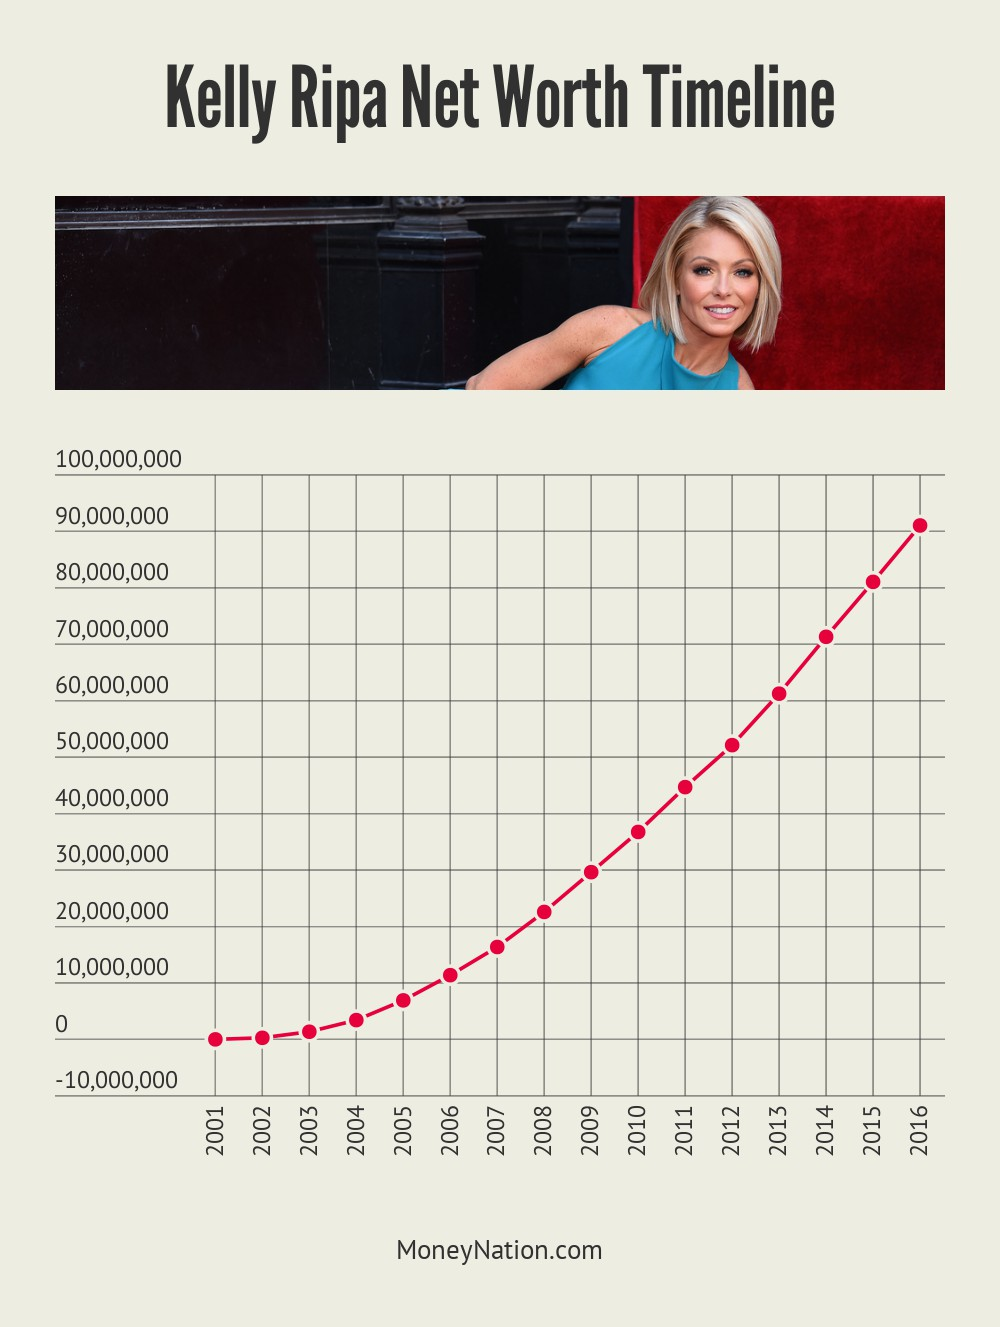 Kelly Ripa Net Worth Timeline